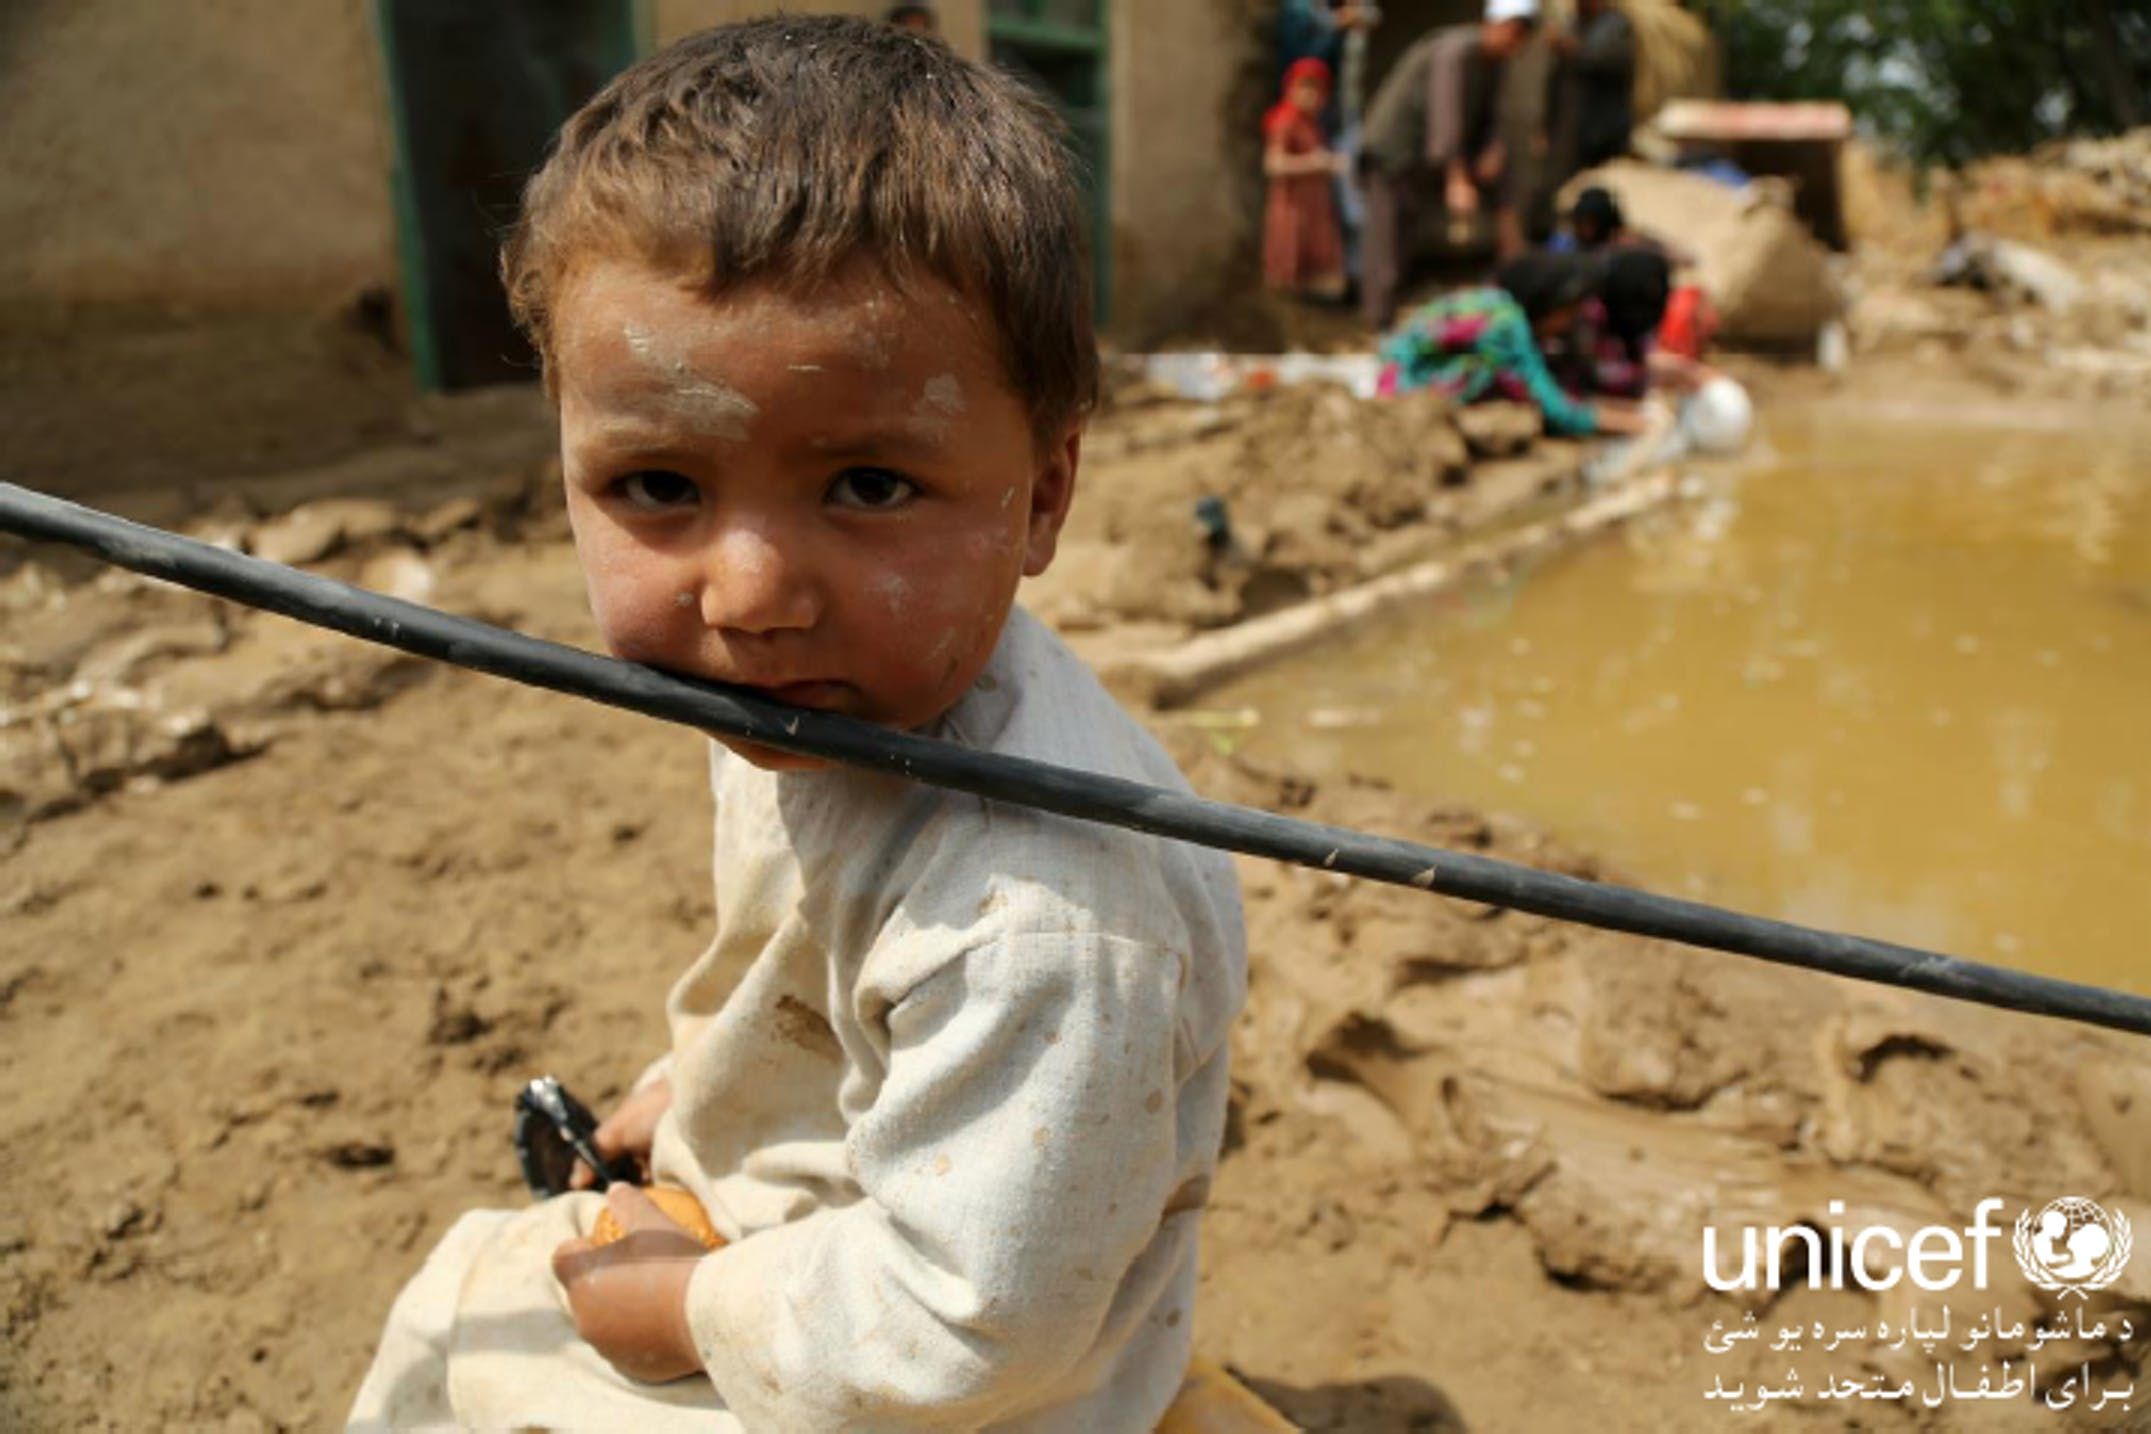 Un bambino in una zona alluvionata a Shaberghan (Afghanistan) - ©UNICEF Afghanistan/2014/Rajat Madhok